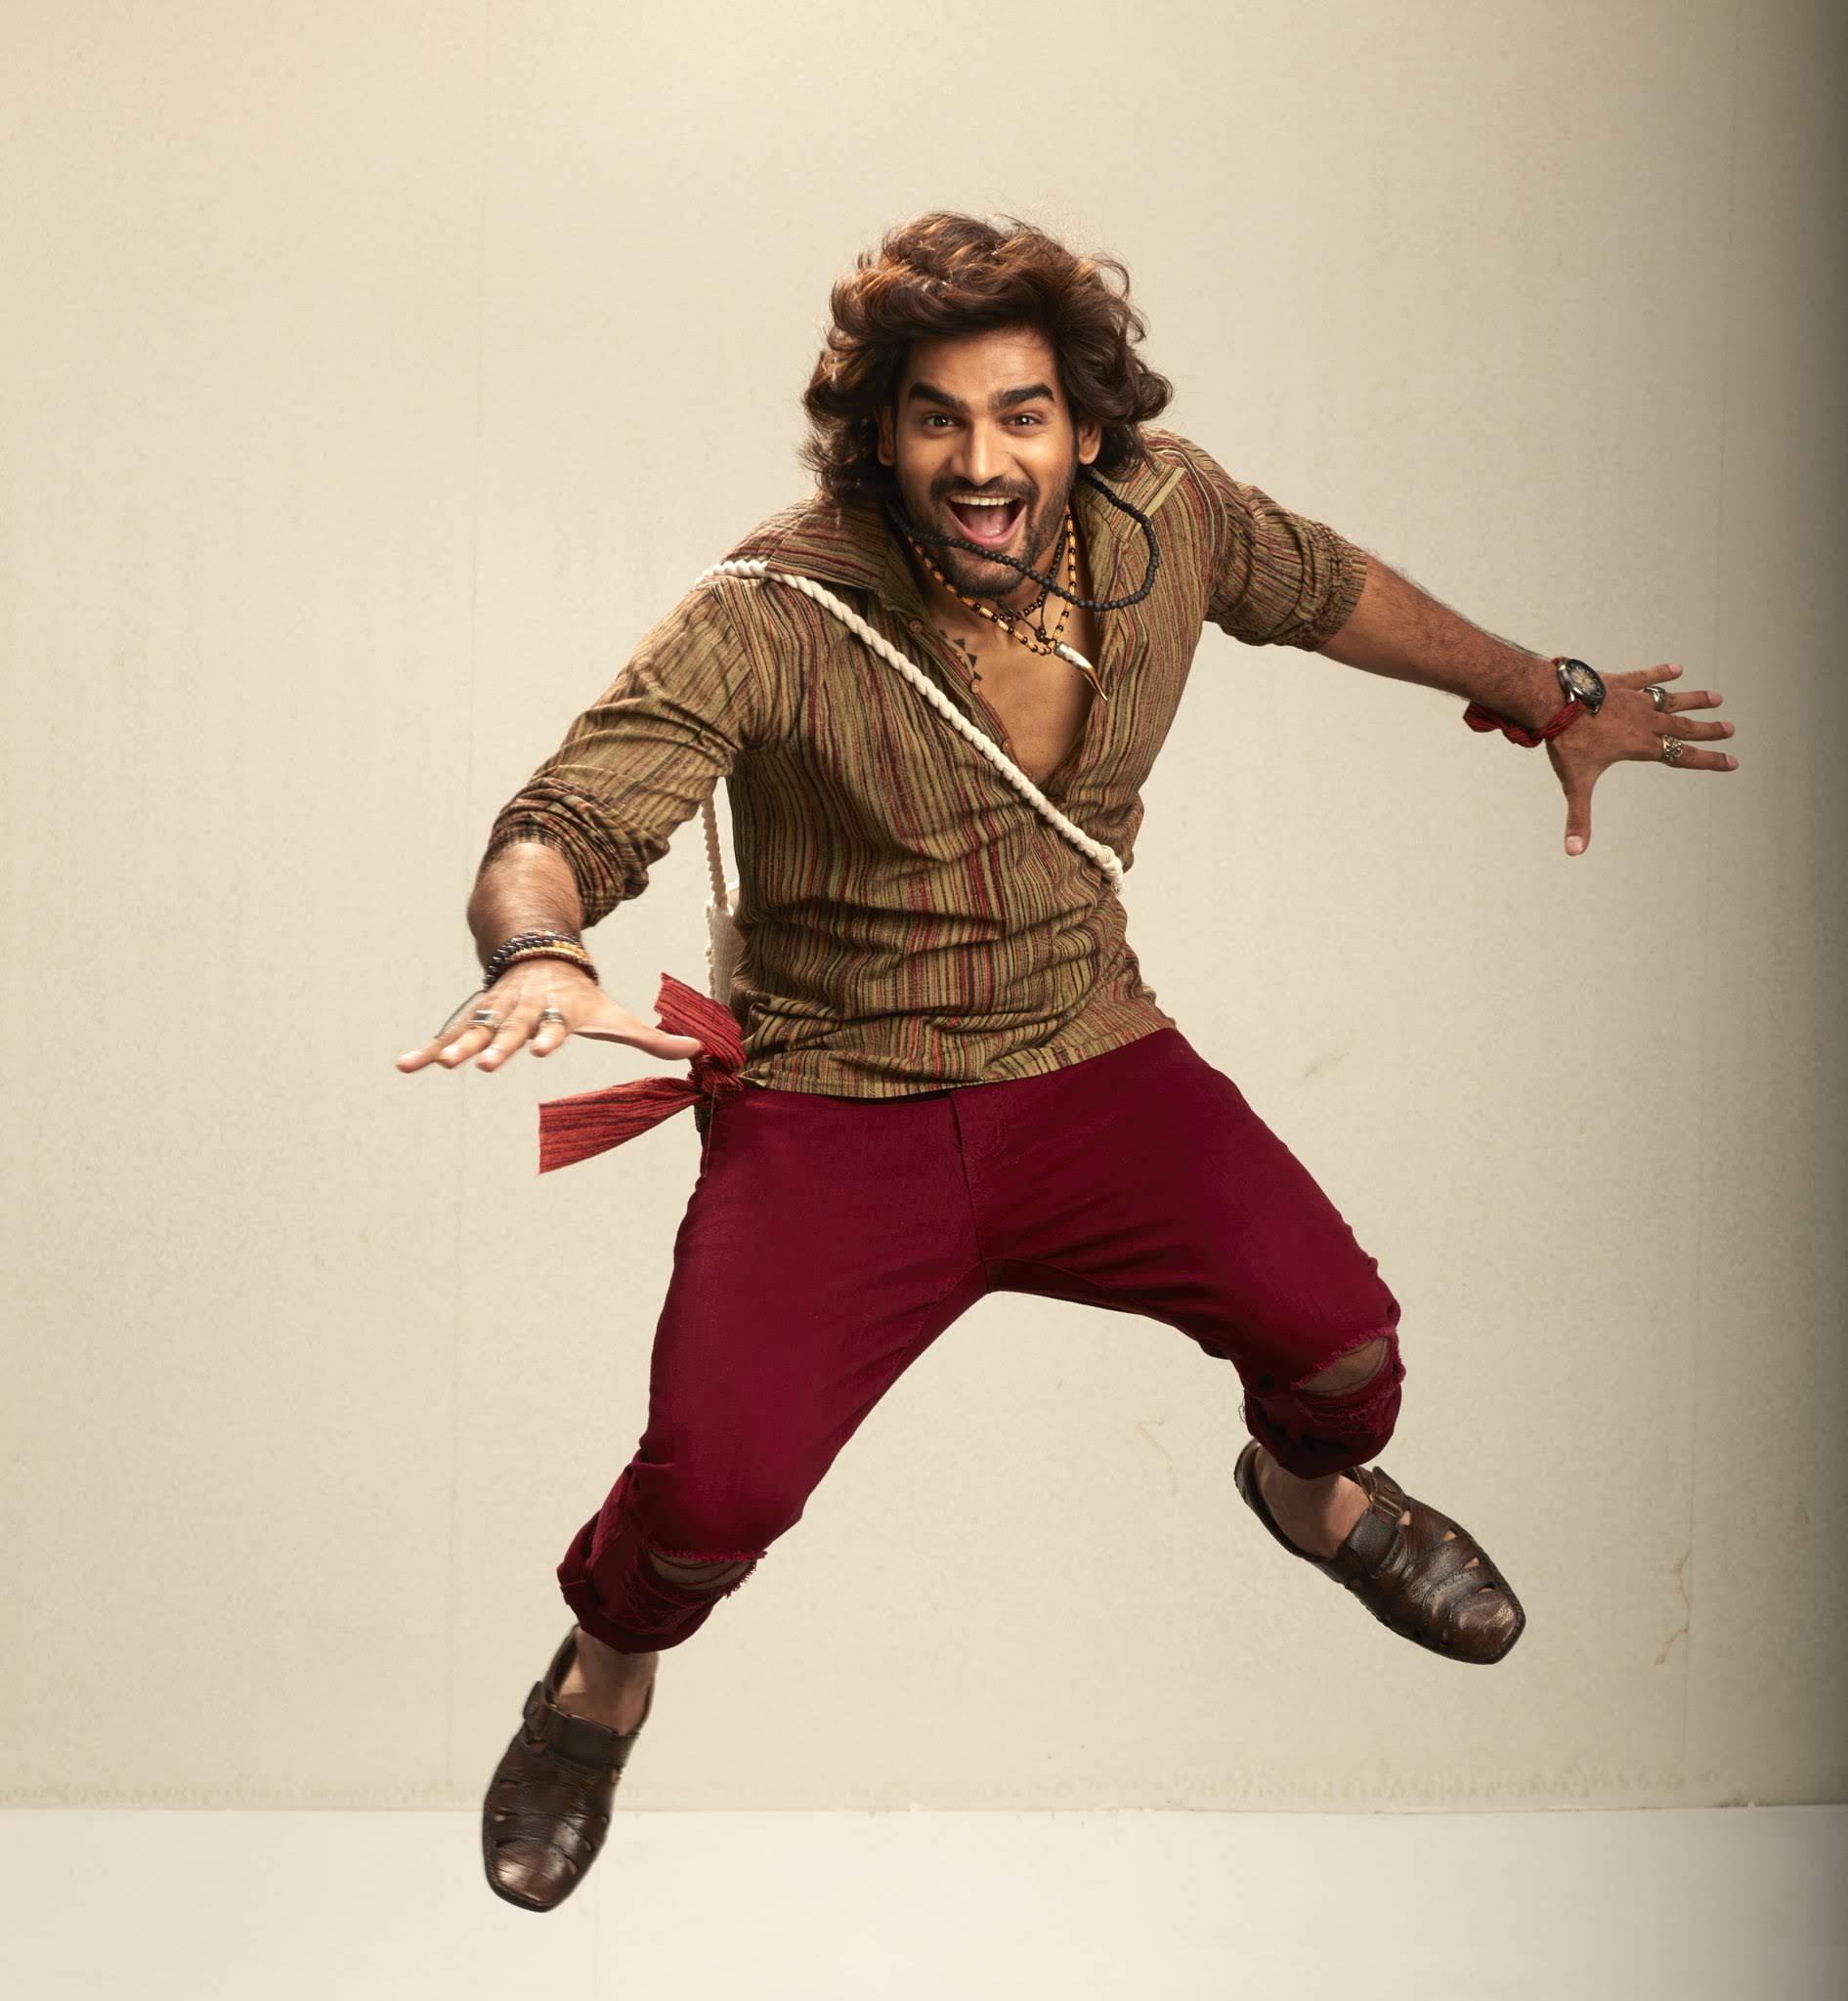 kartikeya-gummakonda-90ml-fame-actor-50